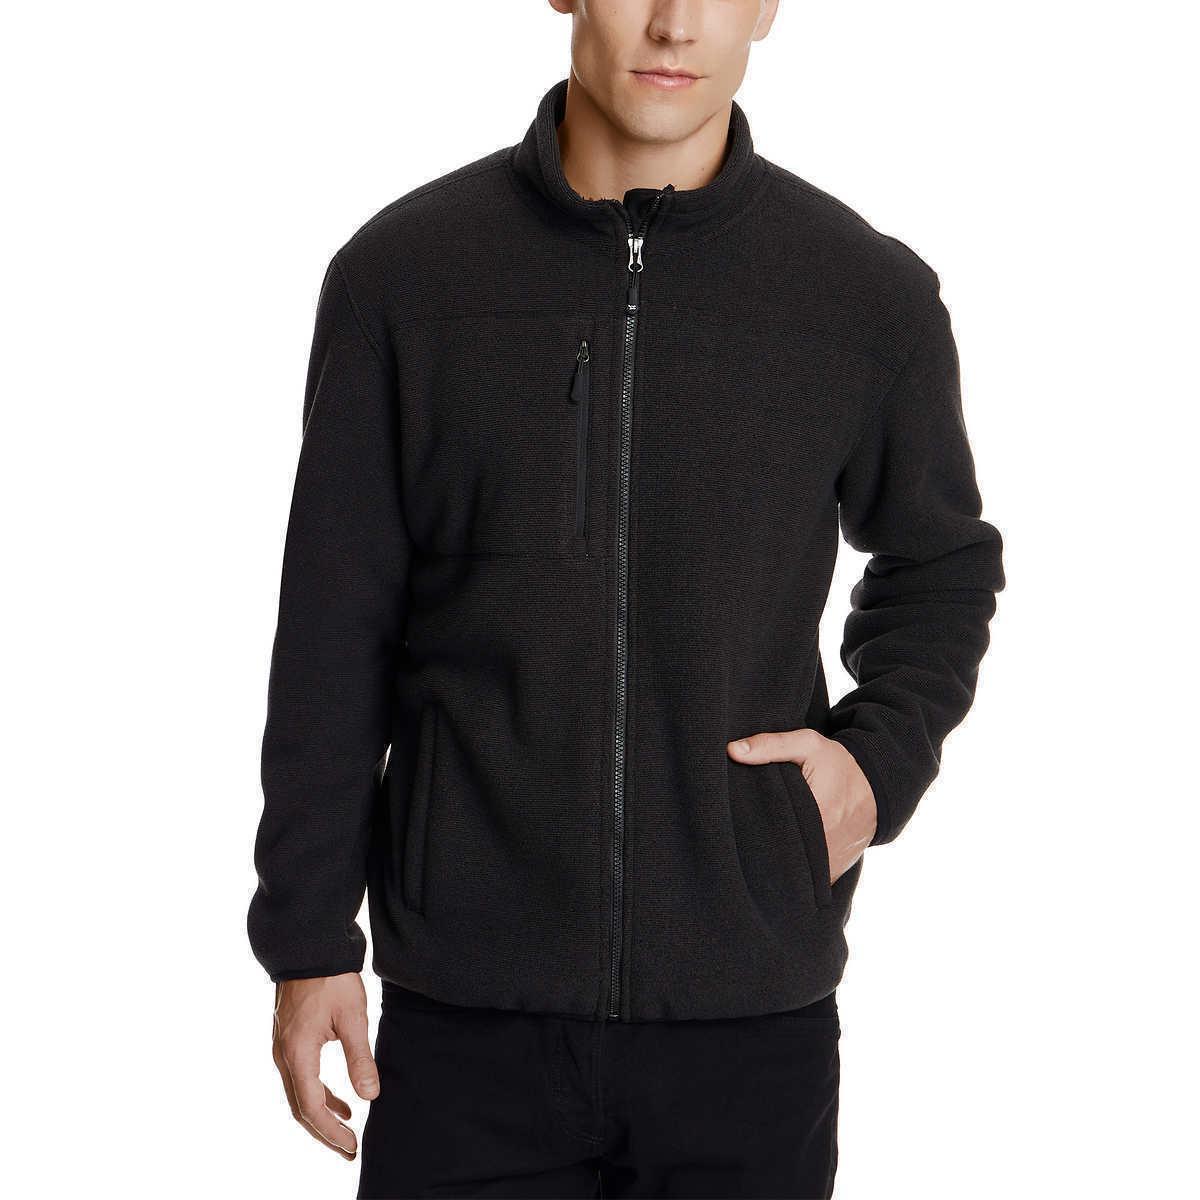 SALE! Degrees Men's Soft Lined Jacket